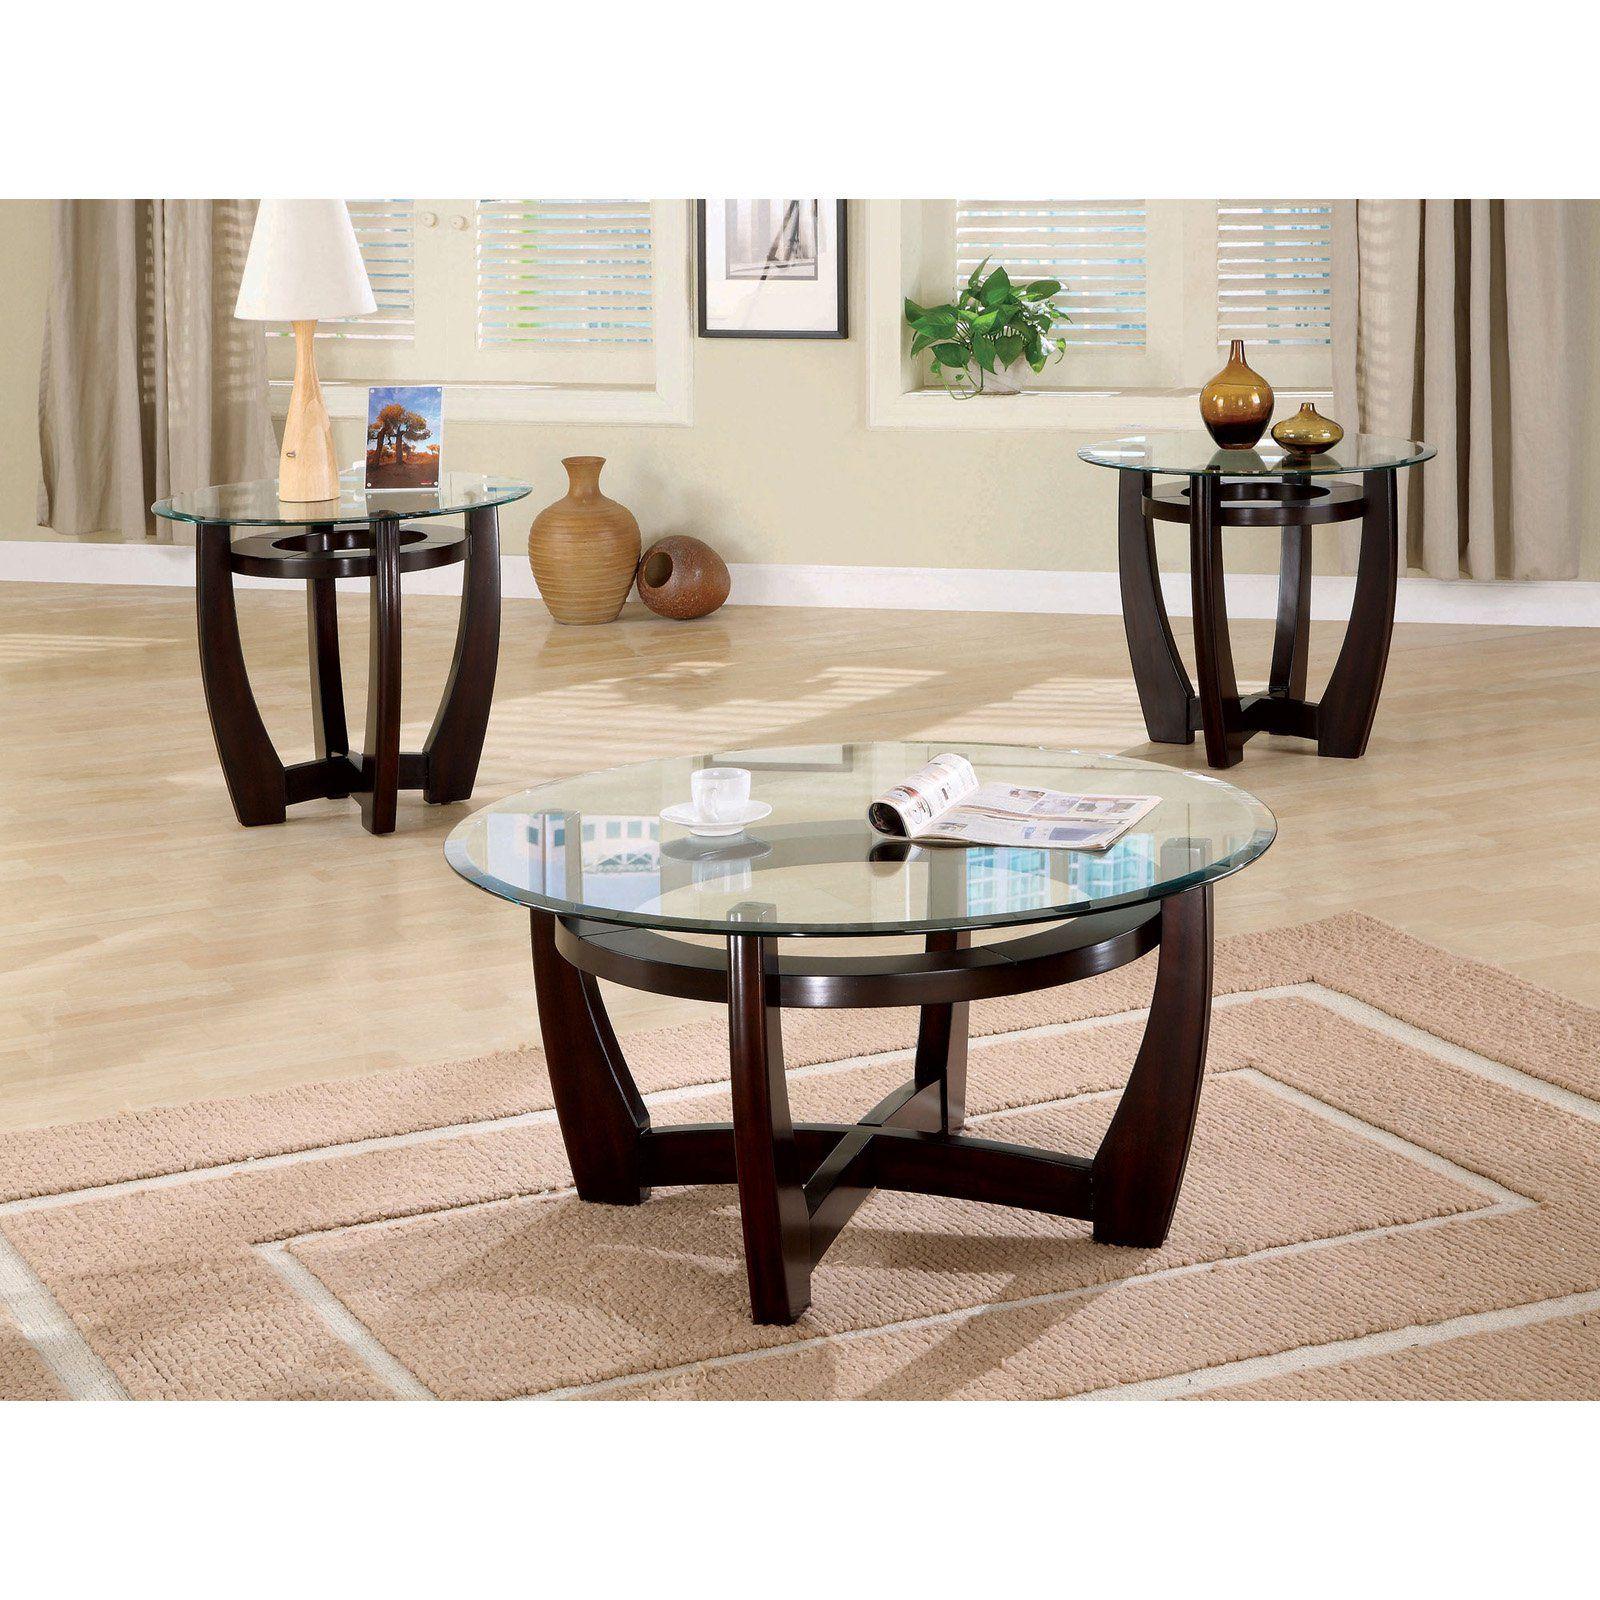 Coaster Furniture 3 Piece Glass Top Coffee Table Set Coffee